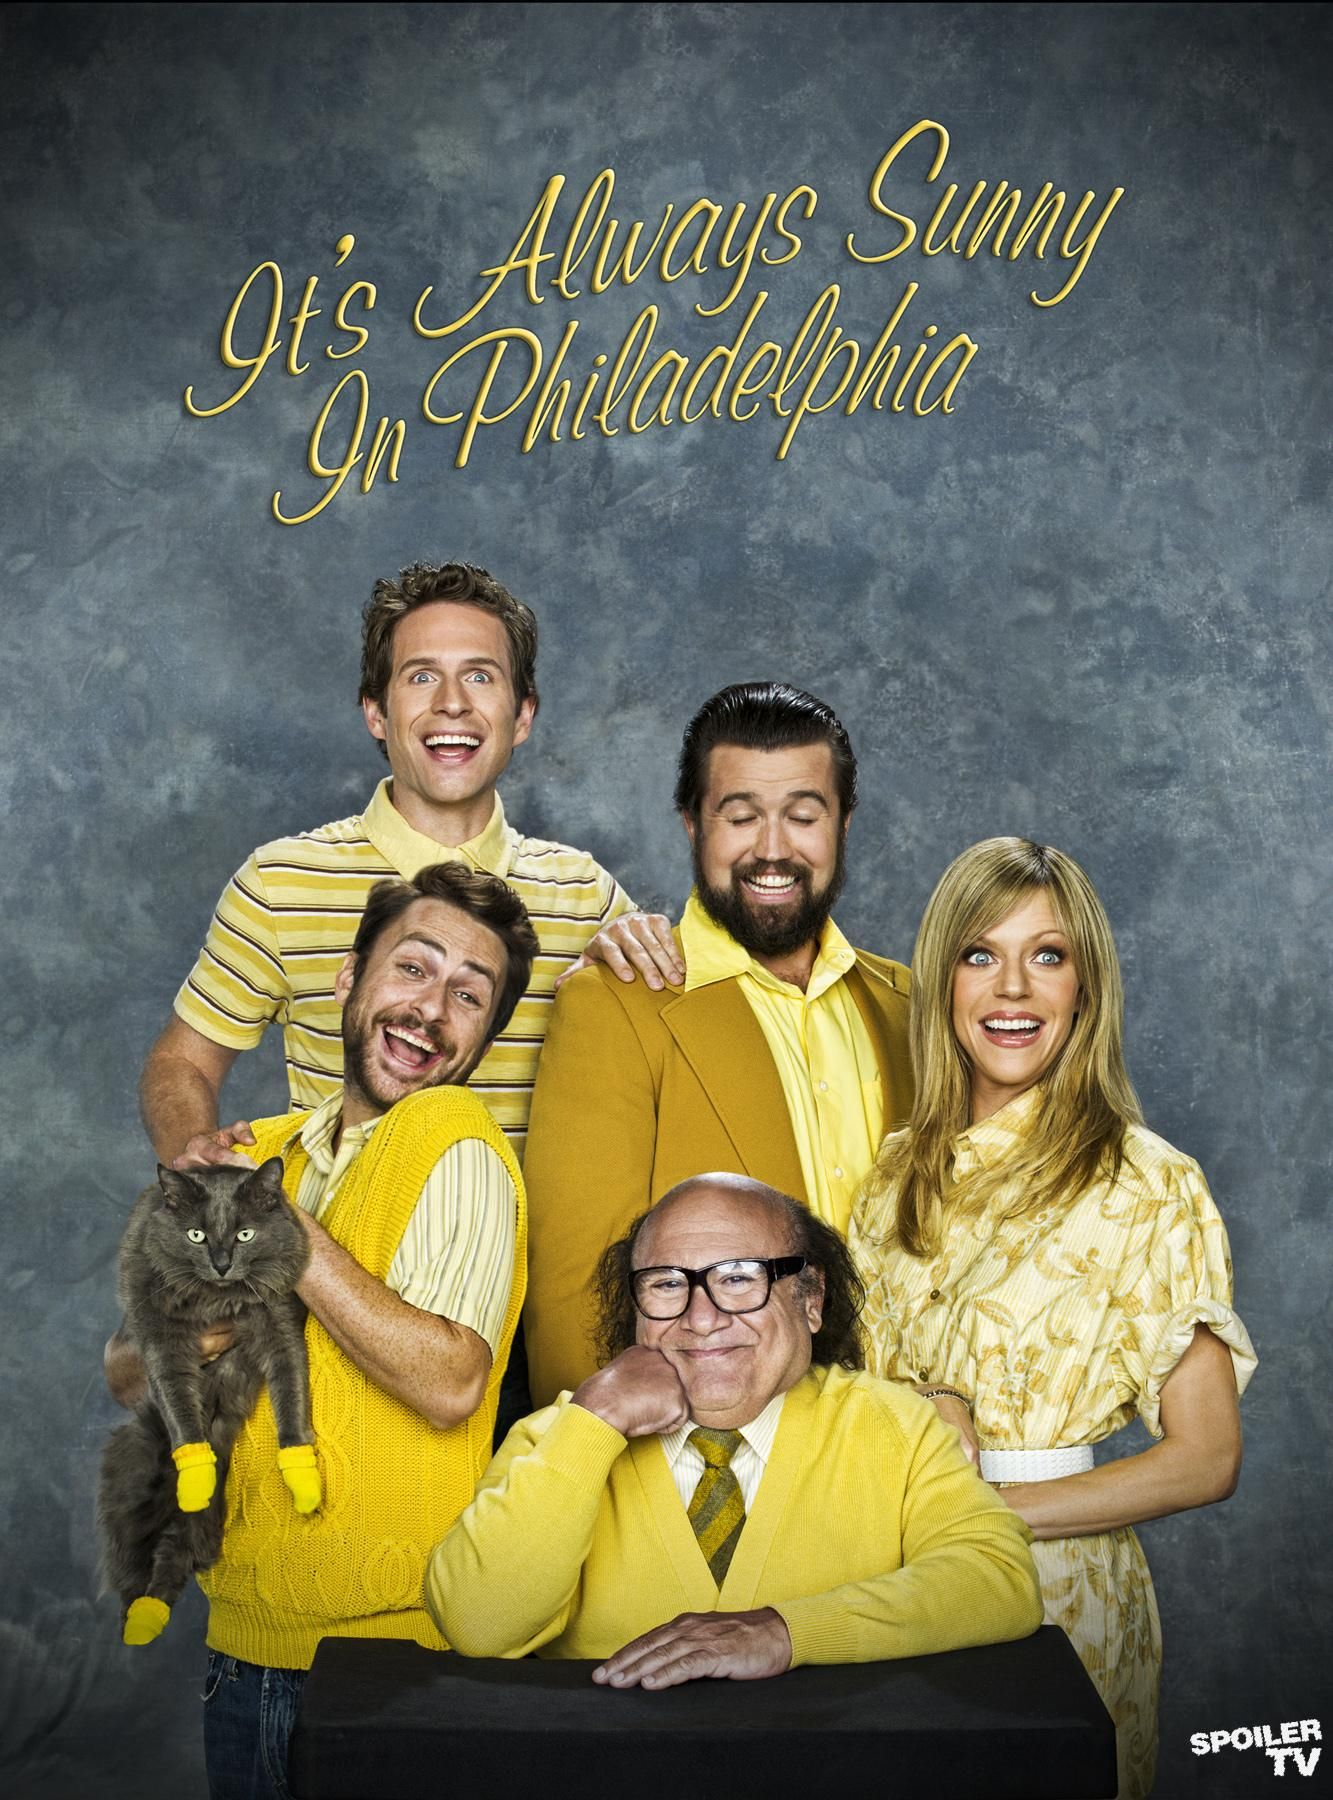 Pin By Kelsey Rogers On Kitten Mittens Awkward Family Photos Sunny In Philadelphia It S Always Sunny In Philadelphia